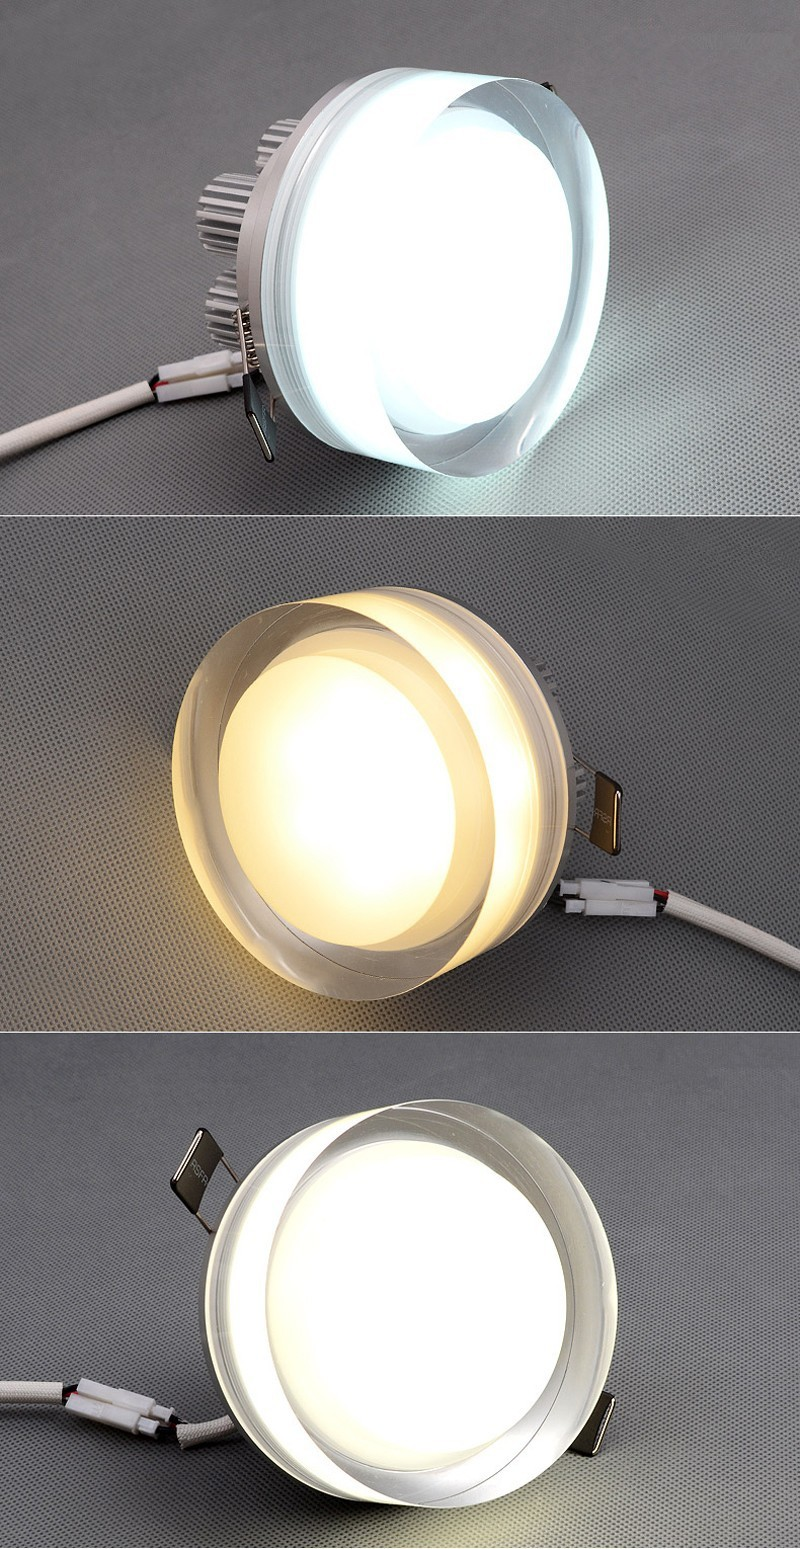 SquareRound  ceiling lamp Crystal LED Downlight 1W3W5W9W  LED Ceiling Lamp Corridor Lights AC110V220V LED Spot Light (3)